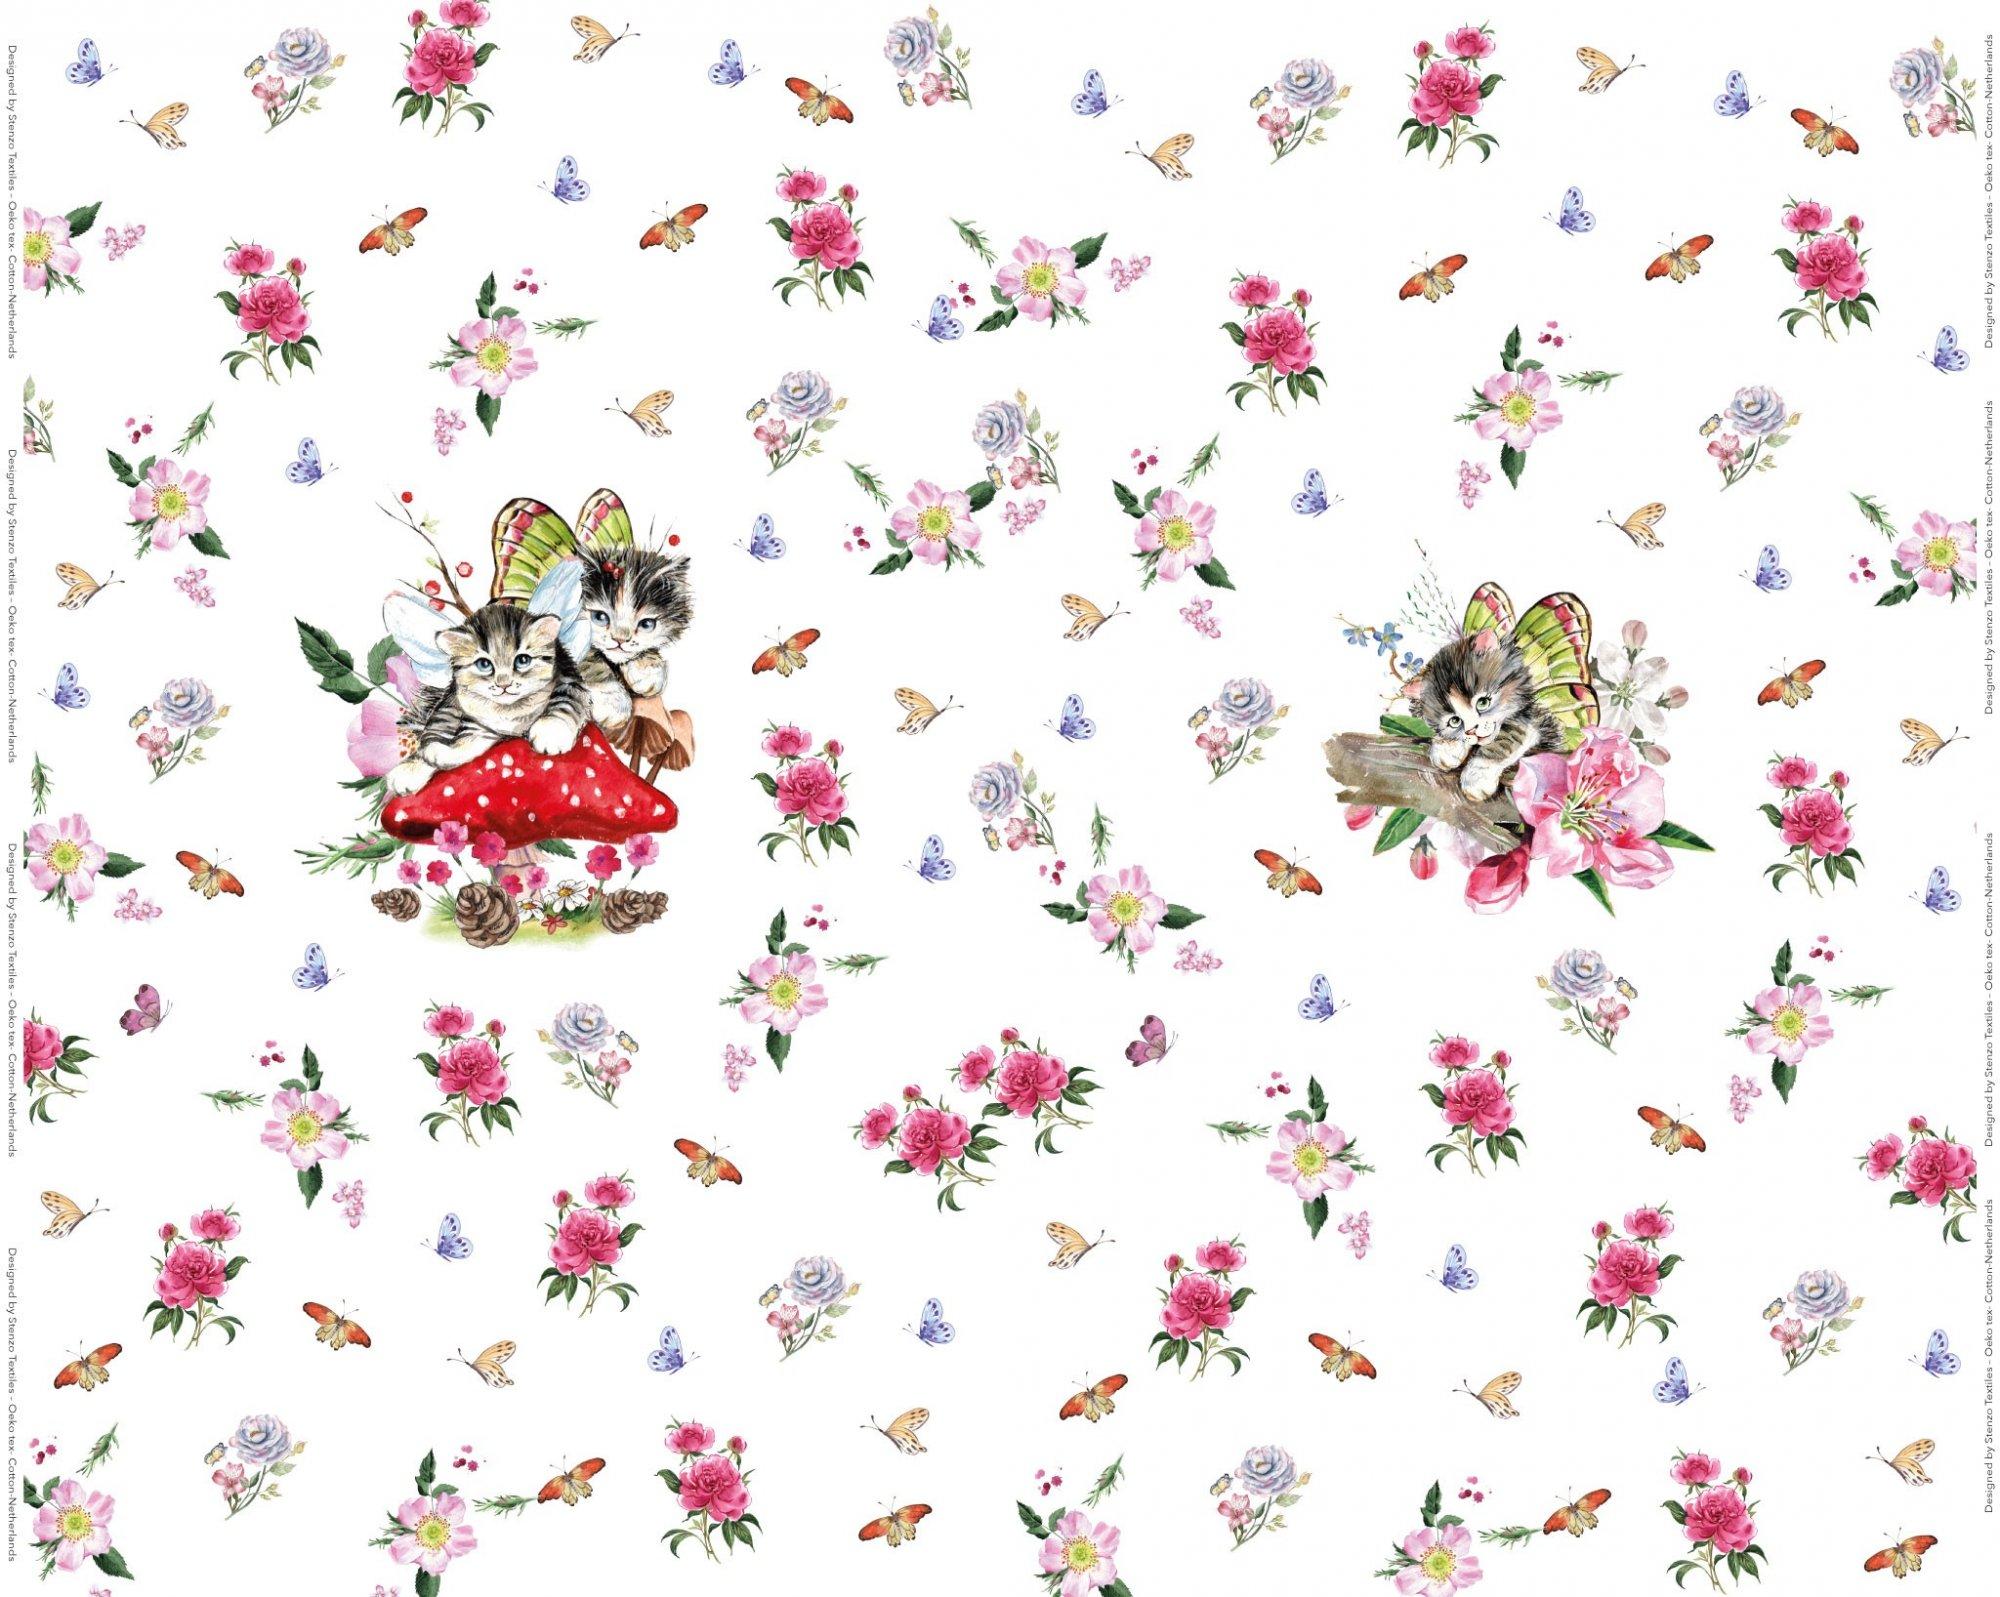 9474909edf2 Cat Butterflies PANEL; Stenzo Jersey Digital Print Fabric 59 W x 27.5 H